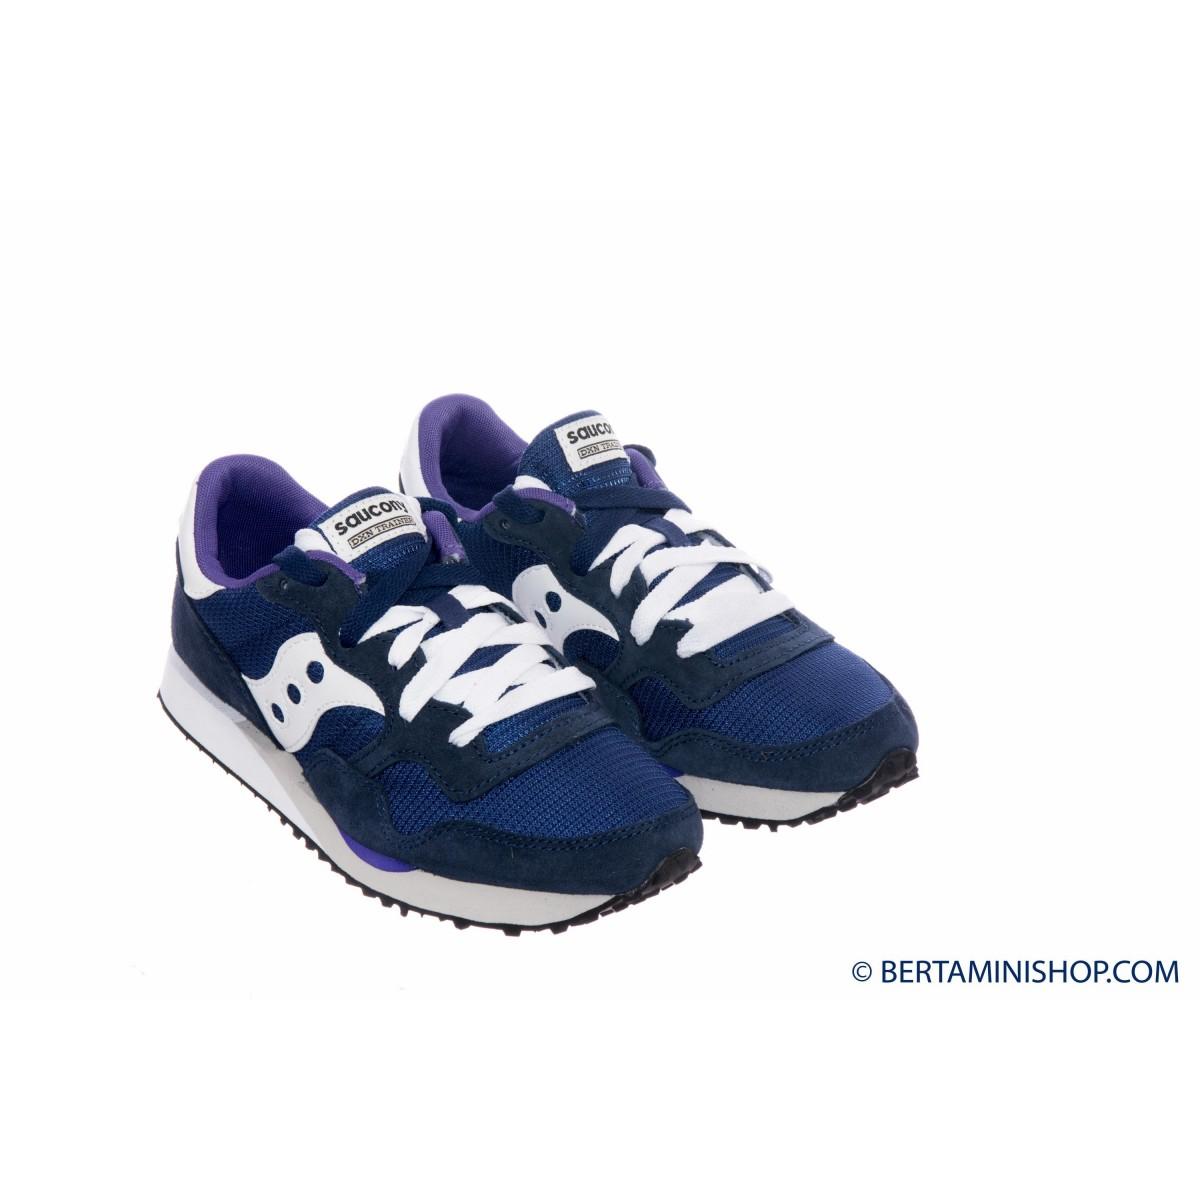 Schuhen Saucony Damen - Dixon 60124 48 - Blue white